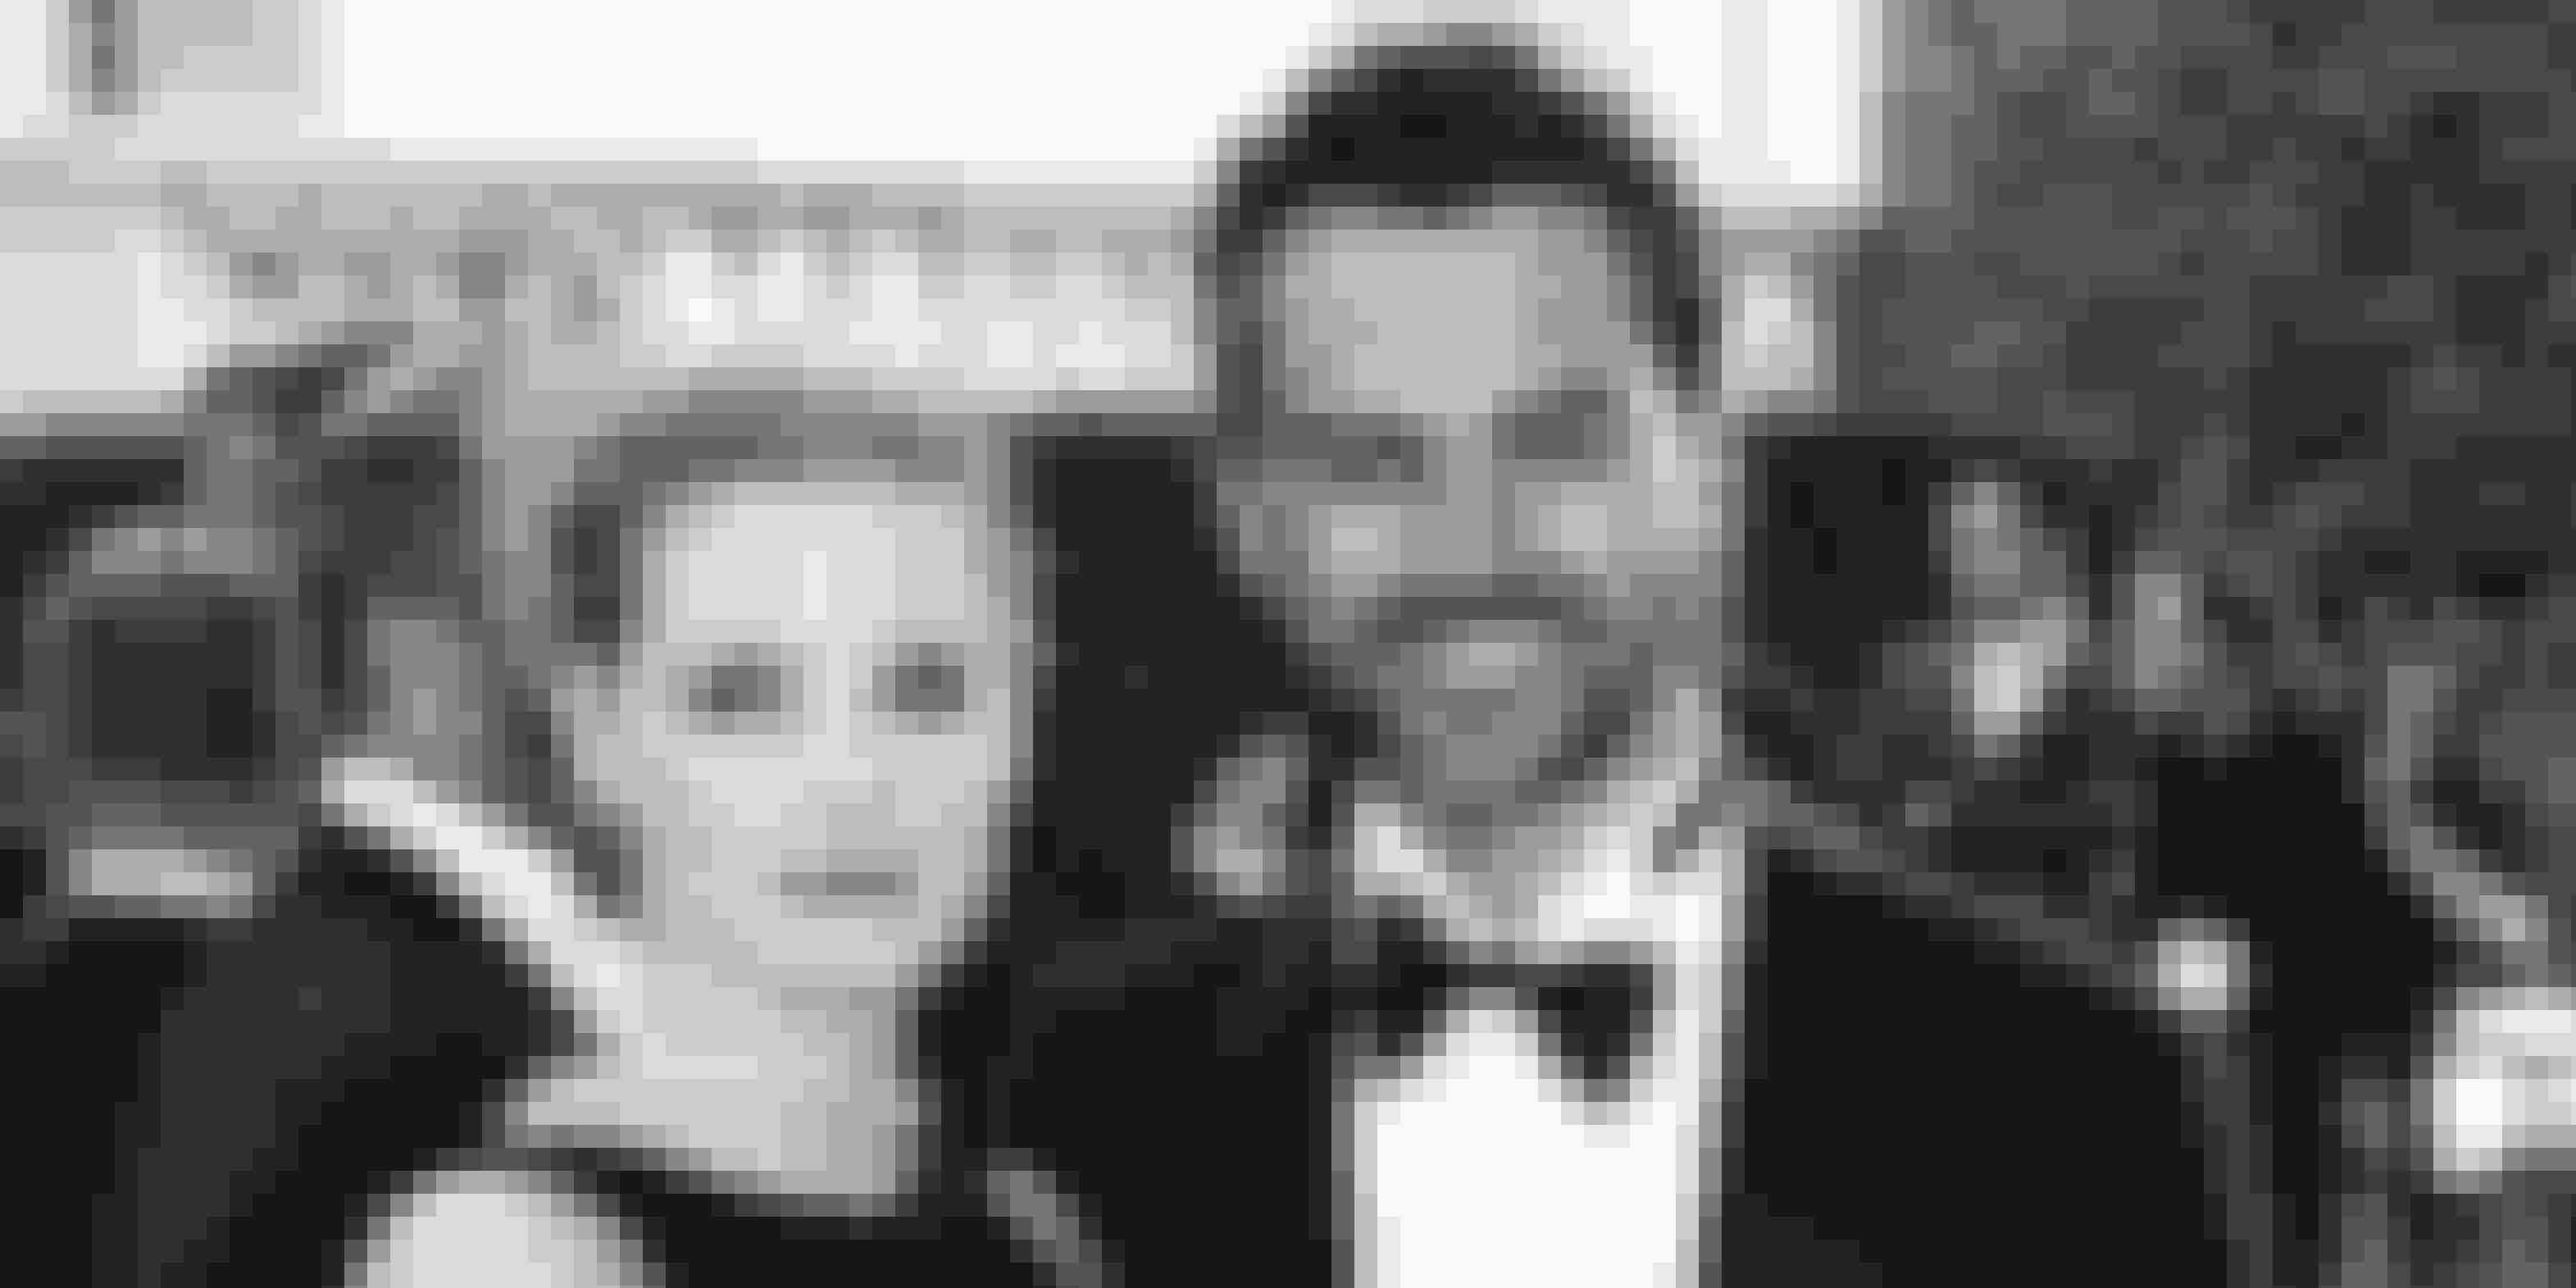 Jessica Chastain blev gift med den italienske modemand Gian Luca Passi de Preposulo i hans hjemland sidste år.